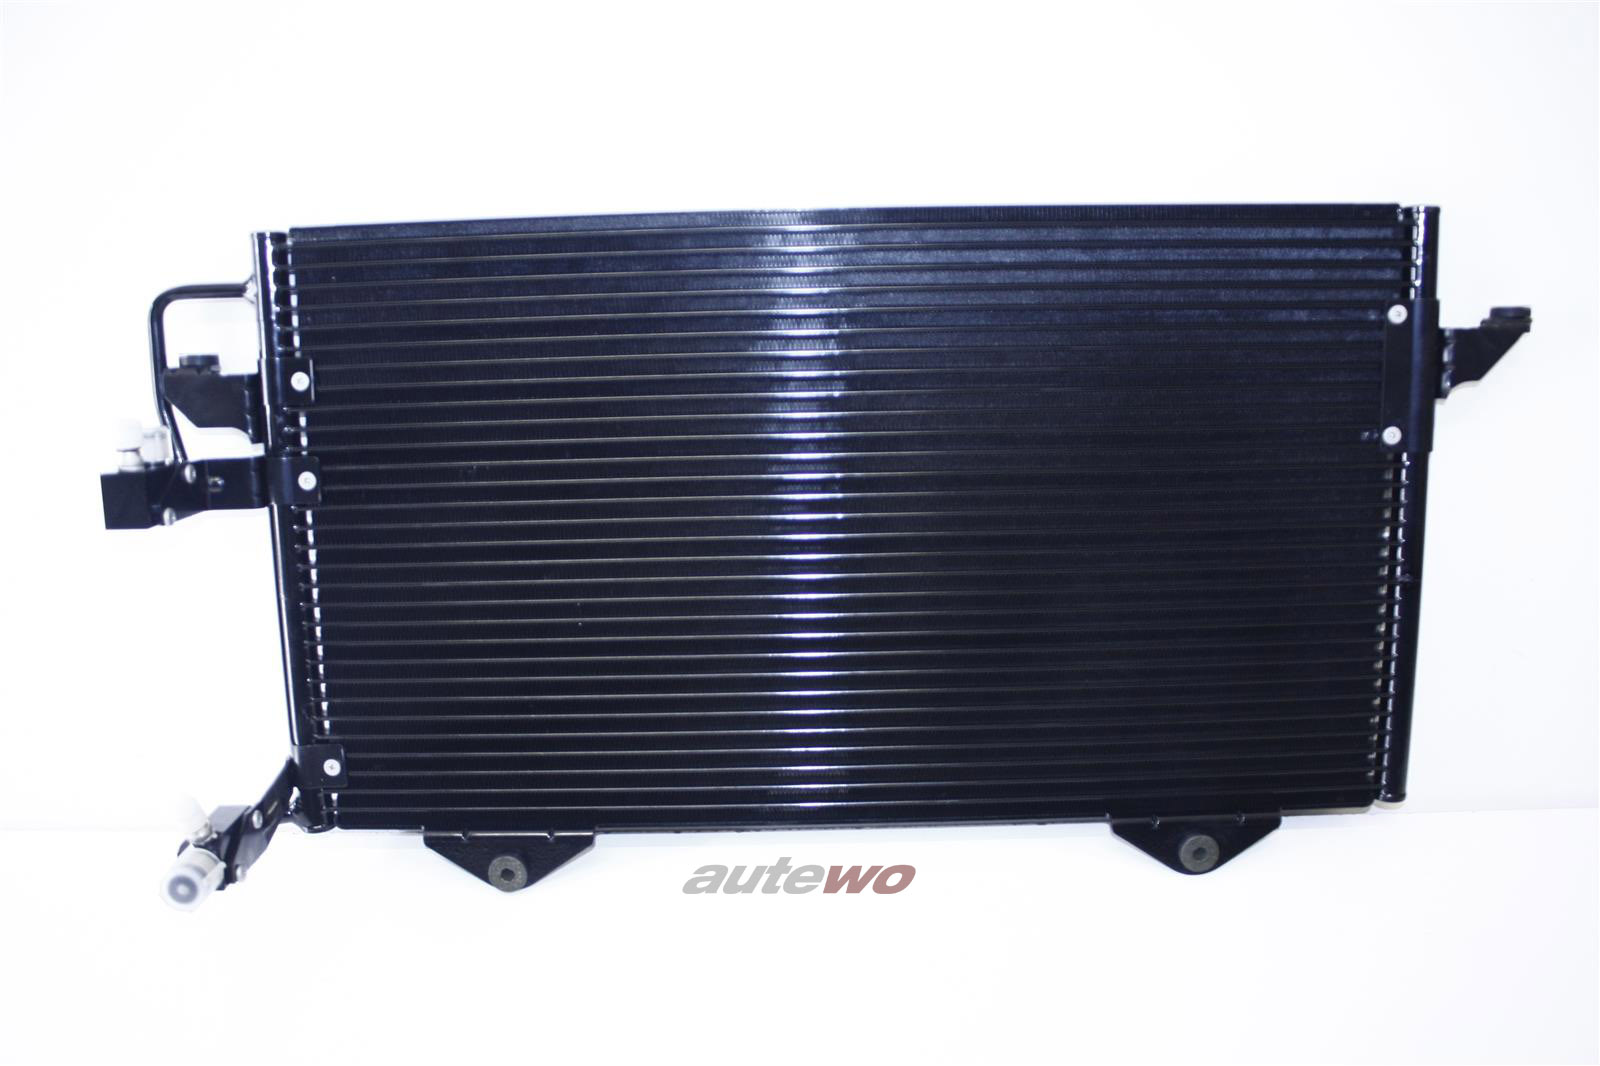 8A0260403D NEU Audi 80 B4 4/6 Zyl. ABC/AAH Klimakondensator Kältemittel R12